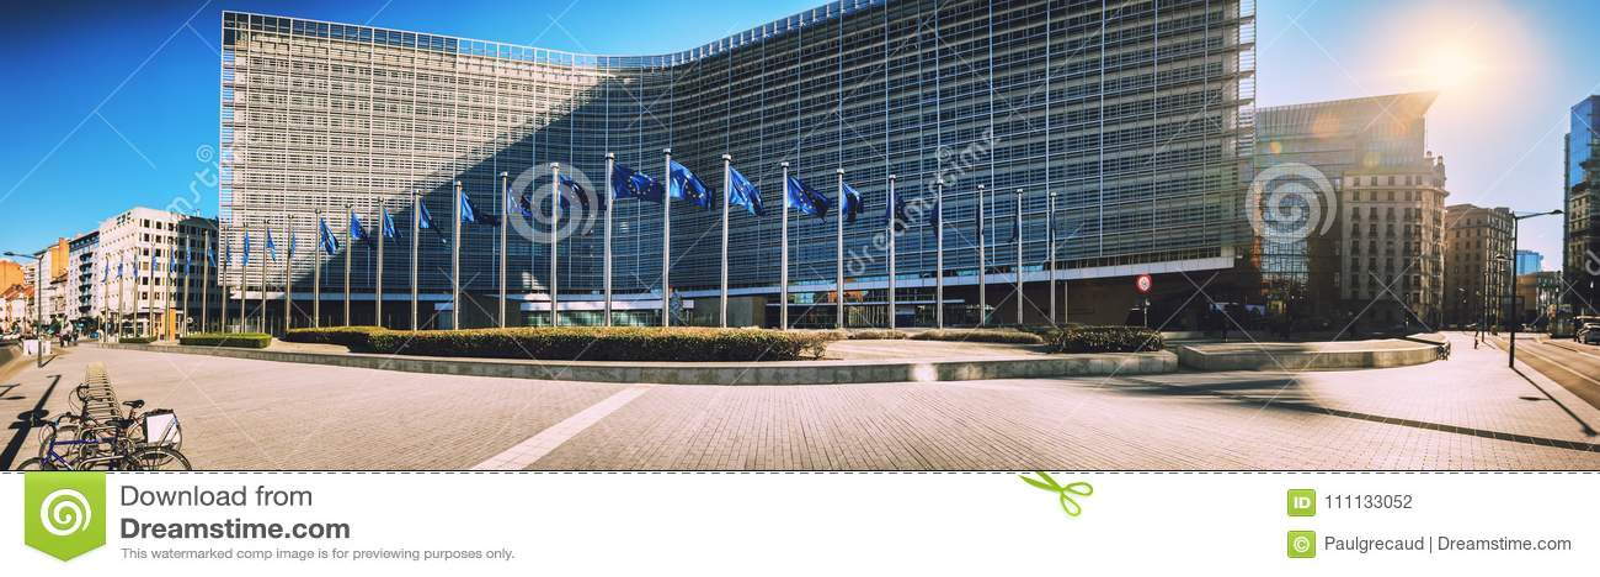 Brussel, België - 25 Februari 2018: De Europese Commissie Headqu